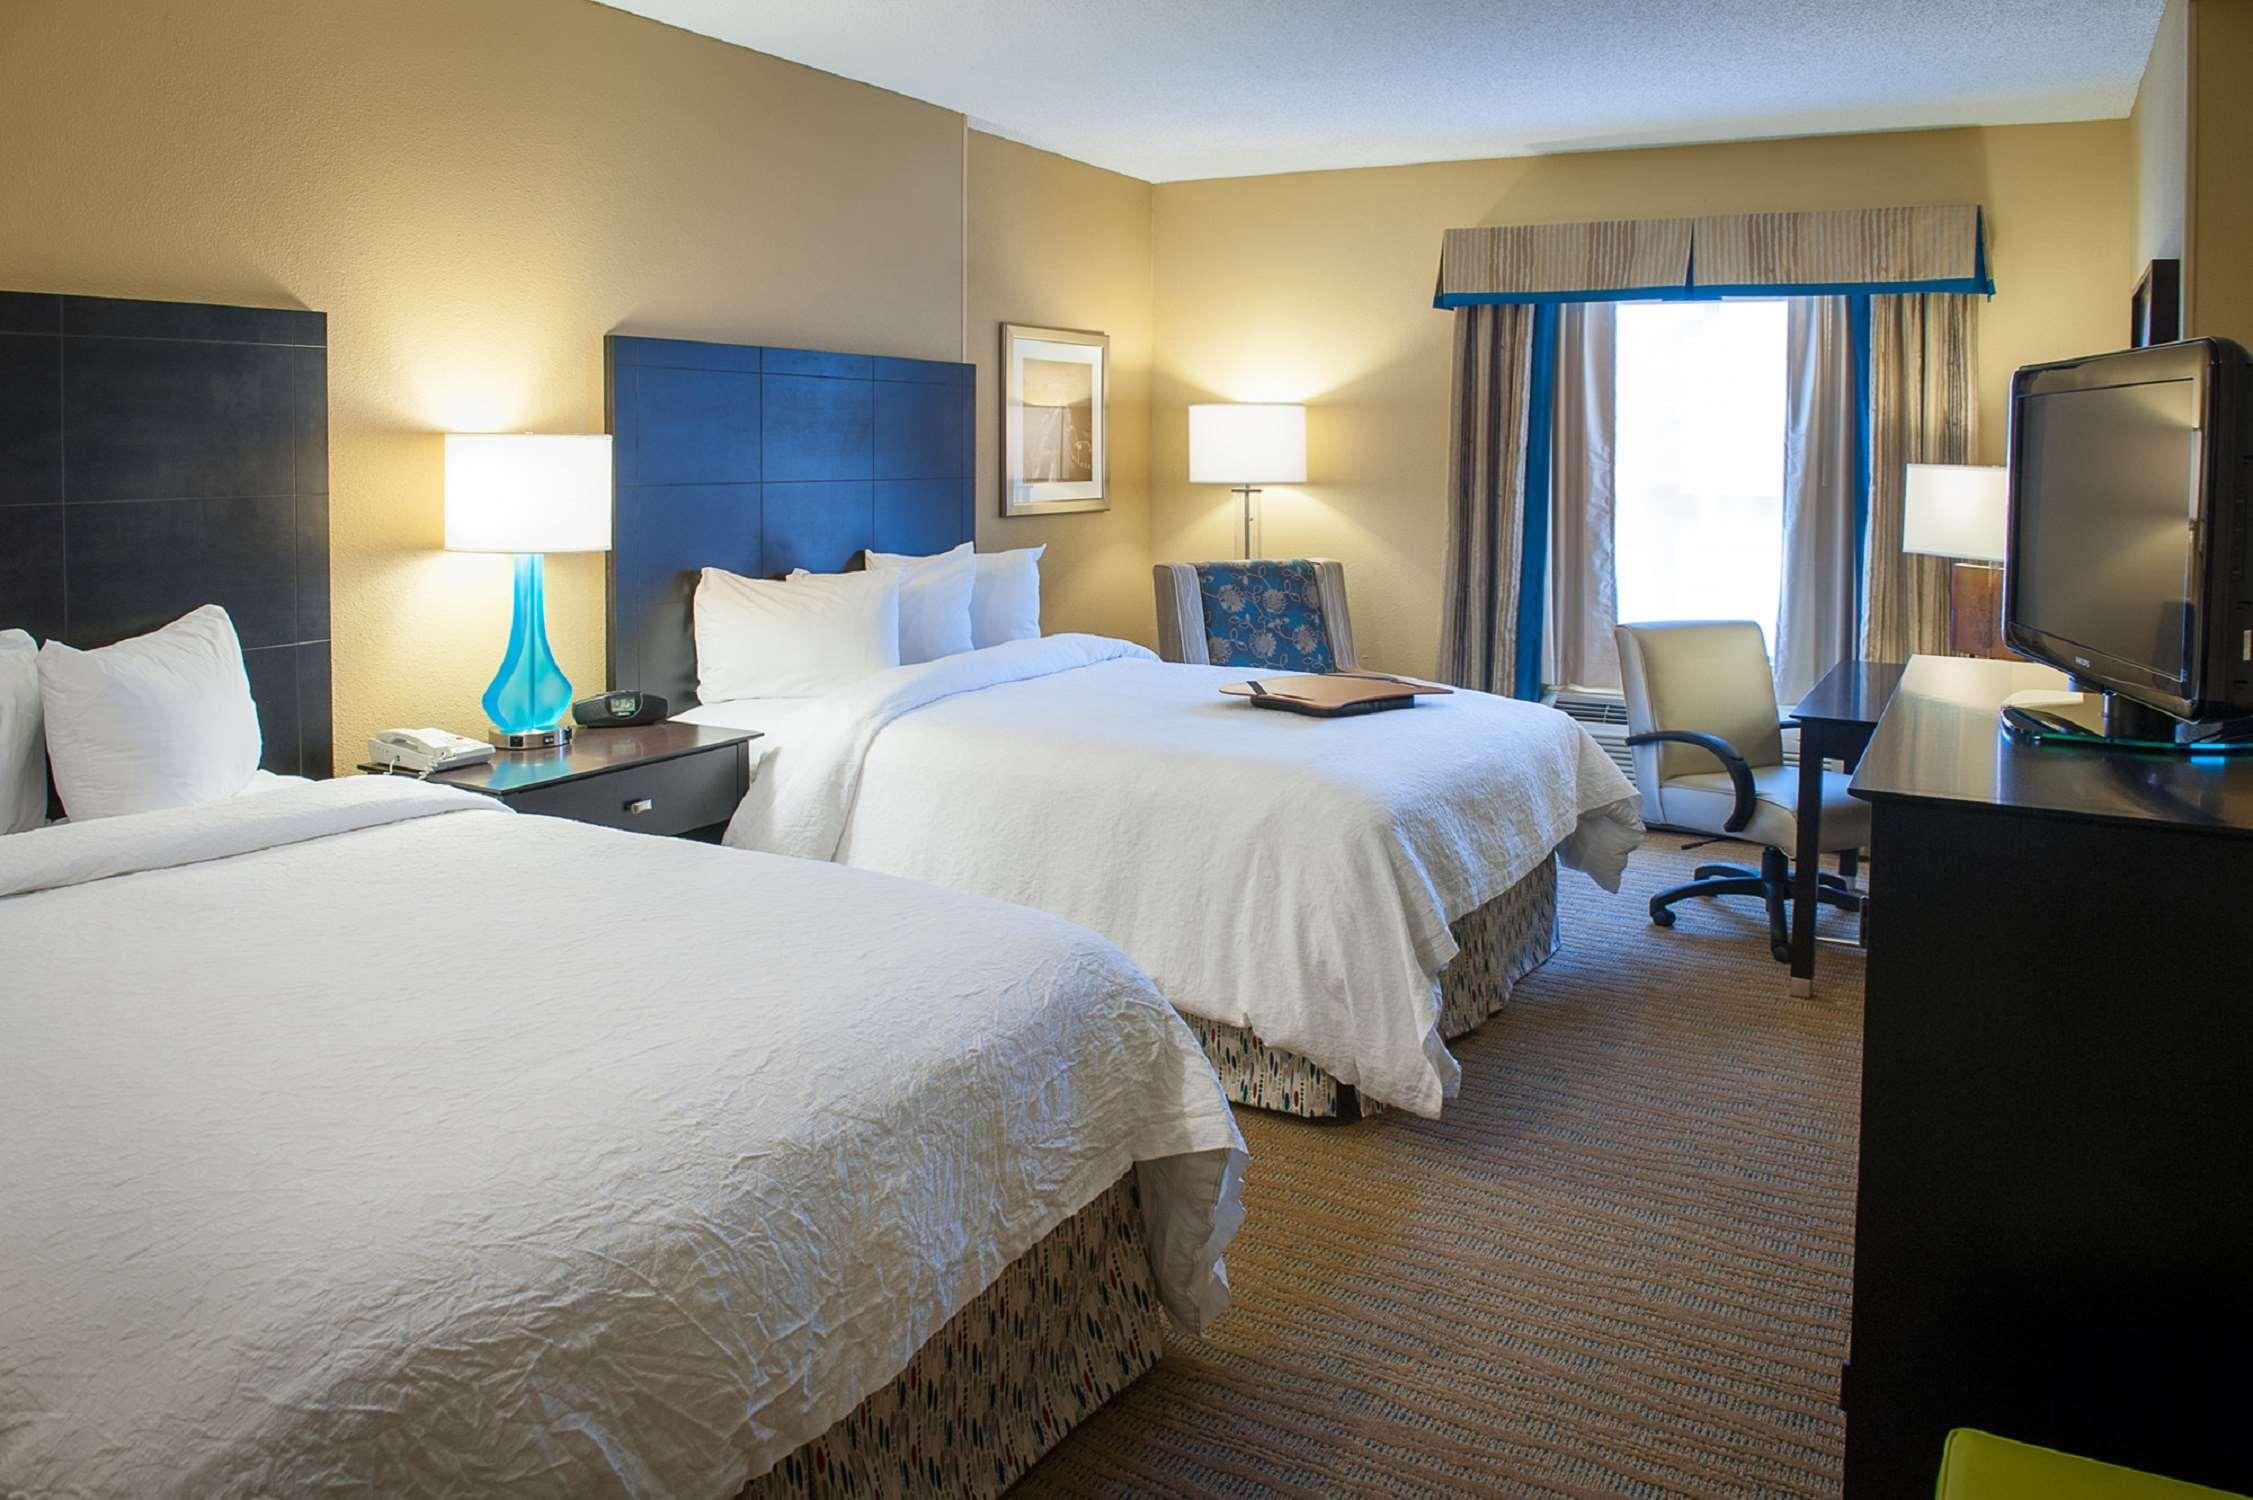 Hampton Inn & Suites St. Petersburg/Downtown image 20